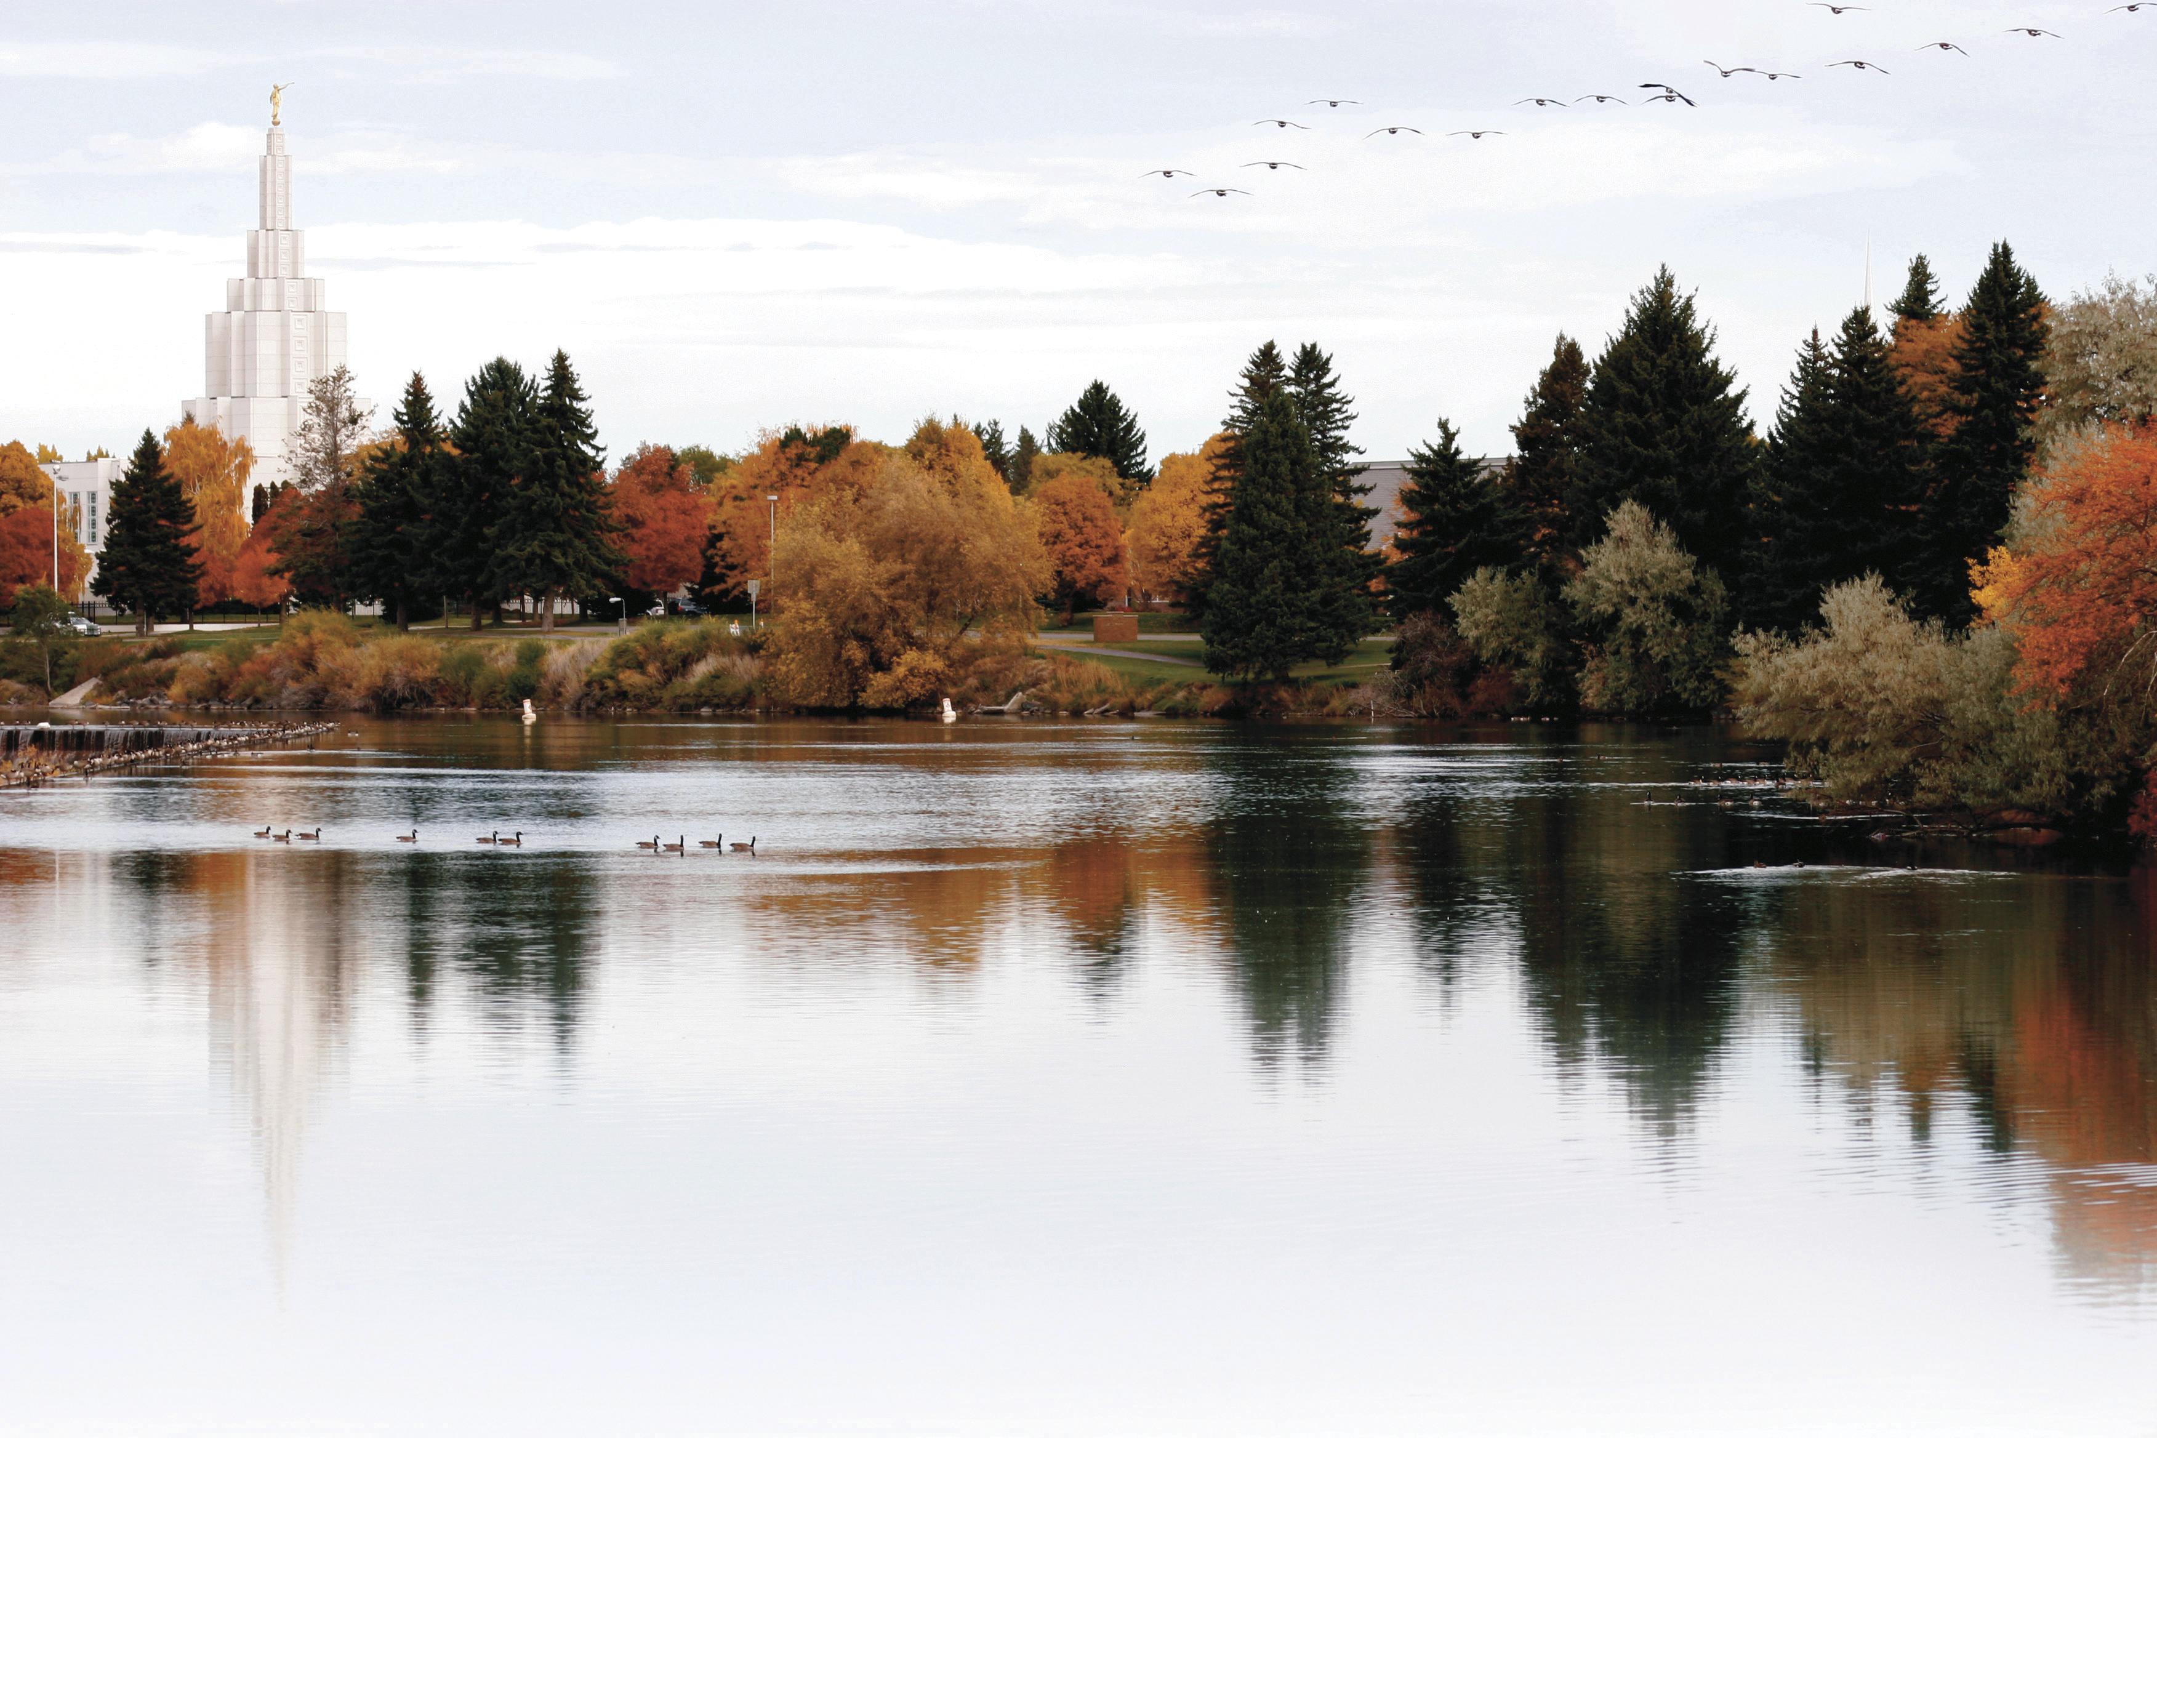 The Idaho Falls Idaho Temple in the fall, including lake and scenery.